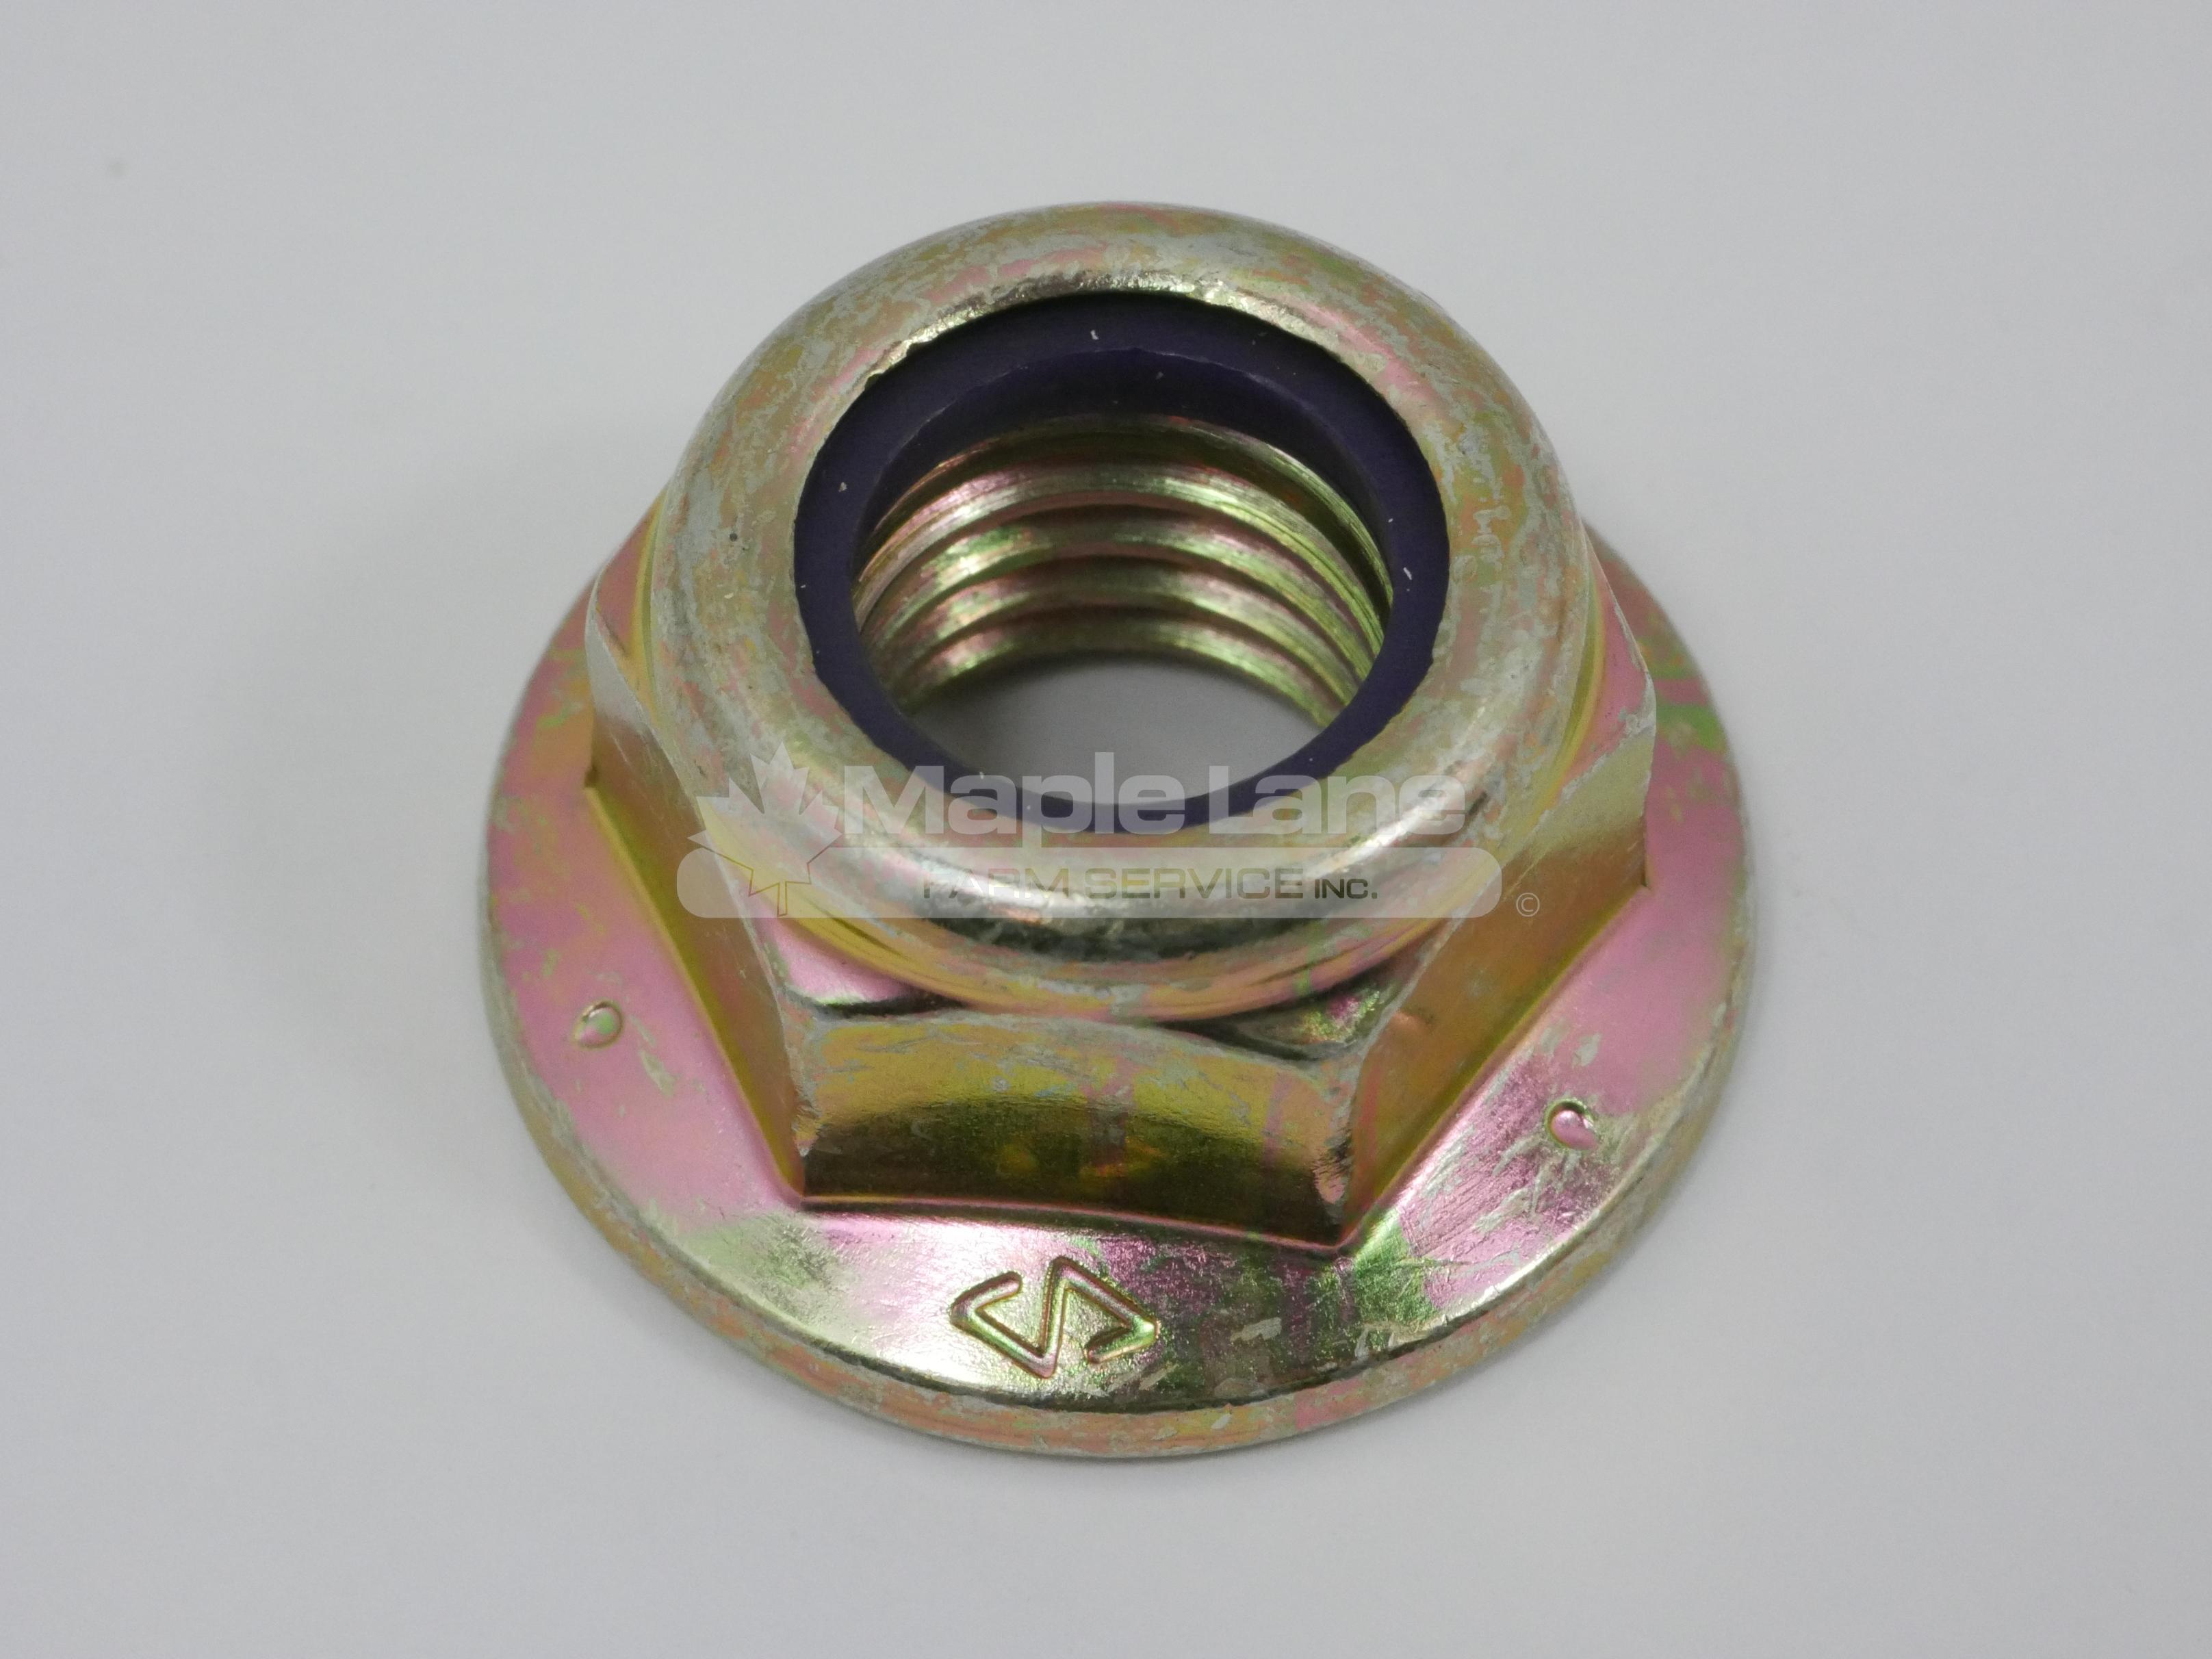 700703922 Flange Lock Nut